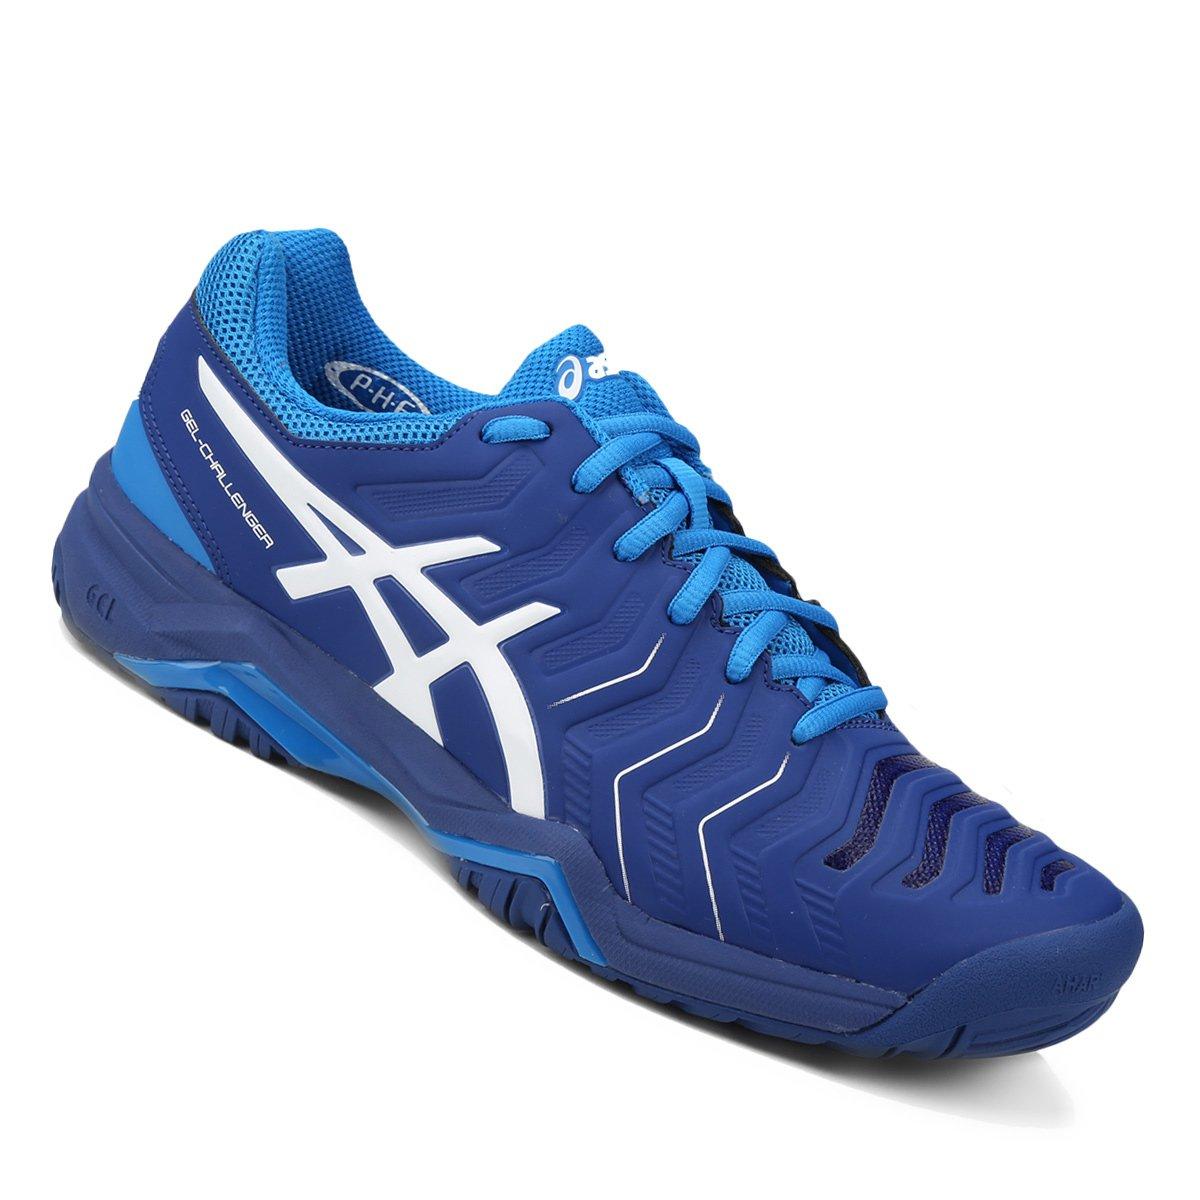 ed4336ae26 Tênis Asics Gel Challenger 11 Masculino - Azul e Branco - Compre ...